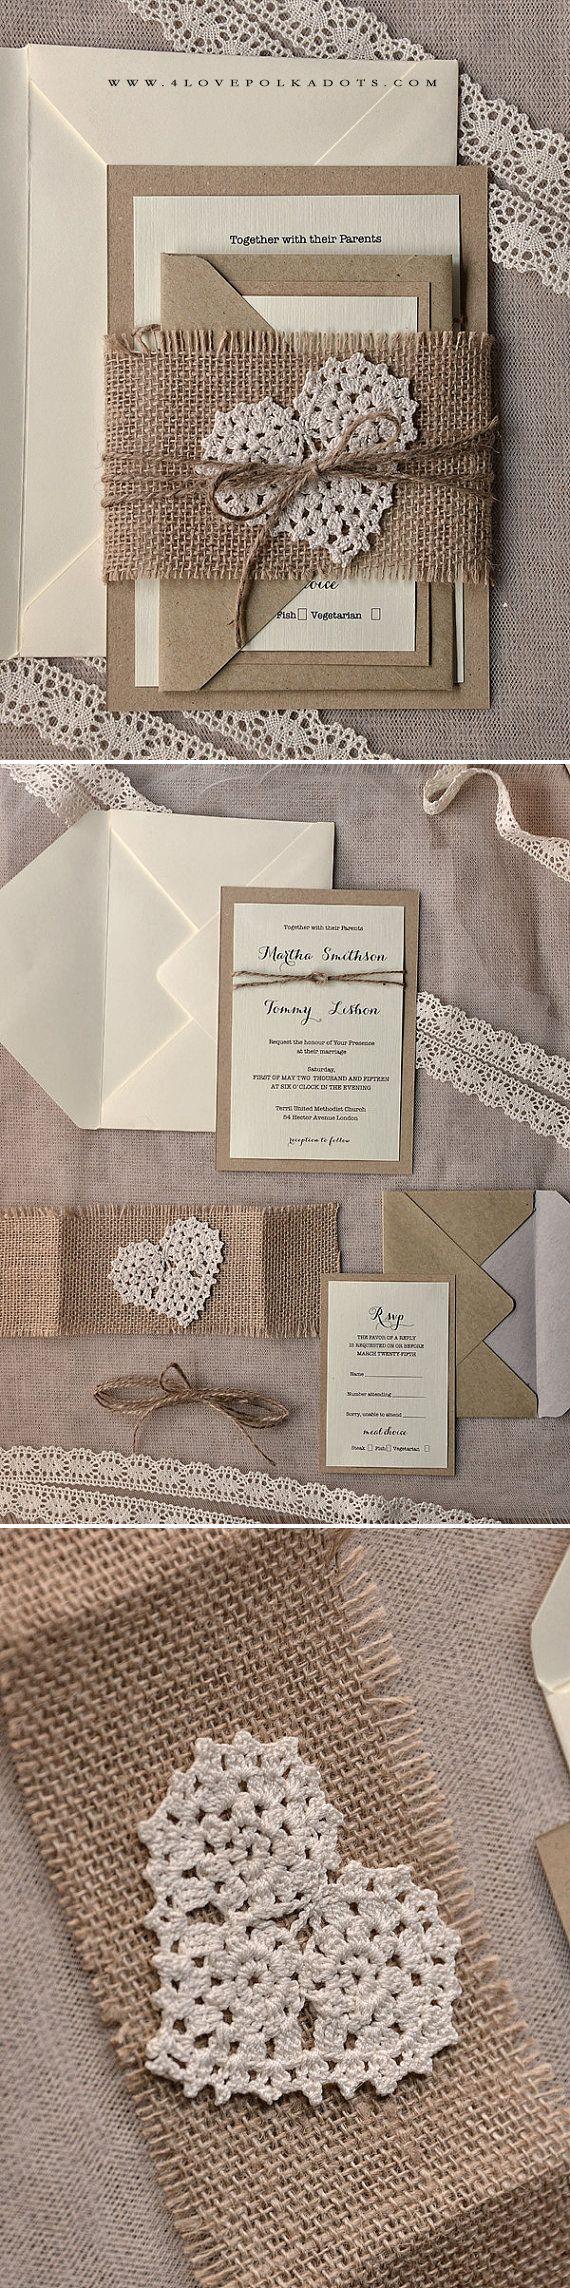 Rustic Wedding Invitation #handmade #rustic #ecopapers #countrywedding